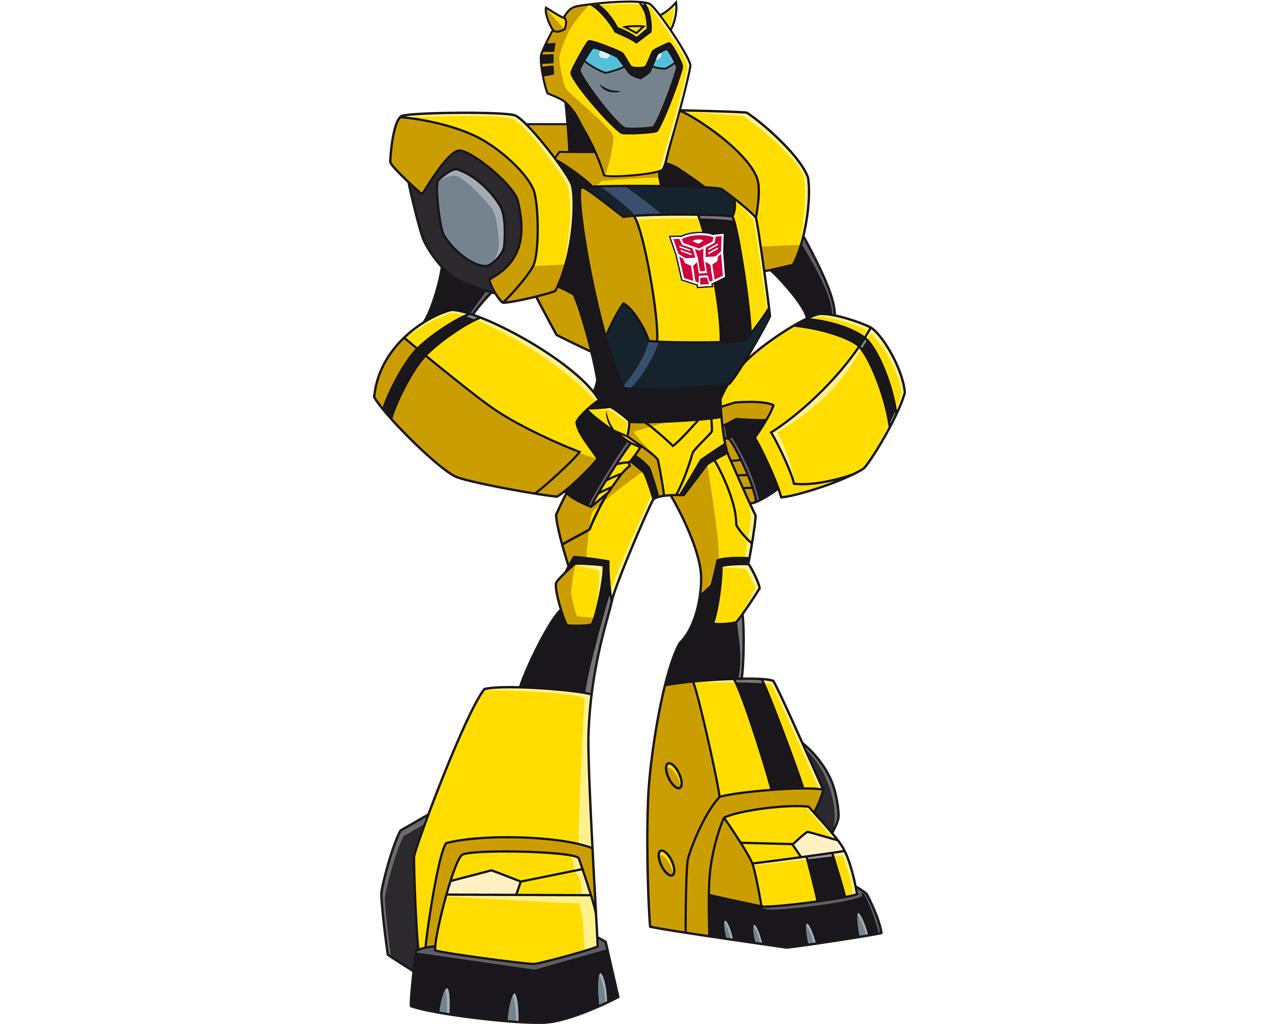 Transformers Clip Art - Cliparts.co